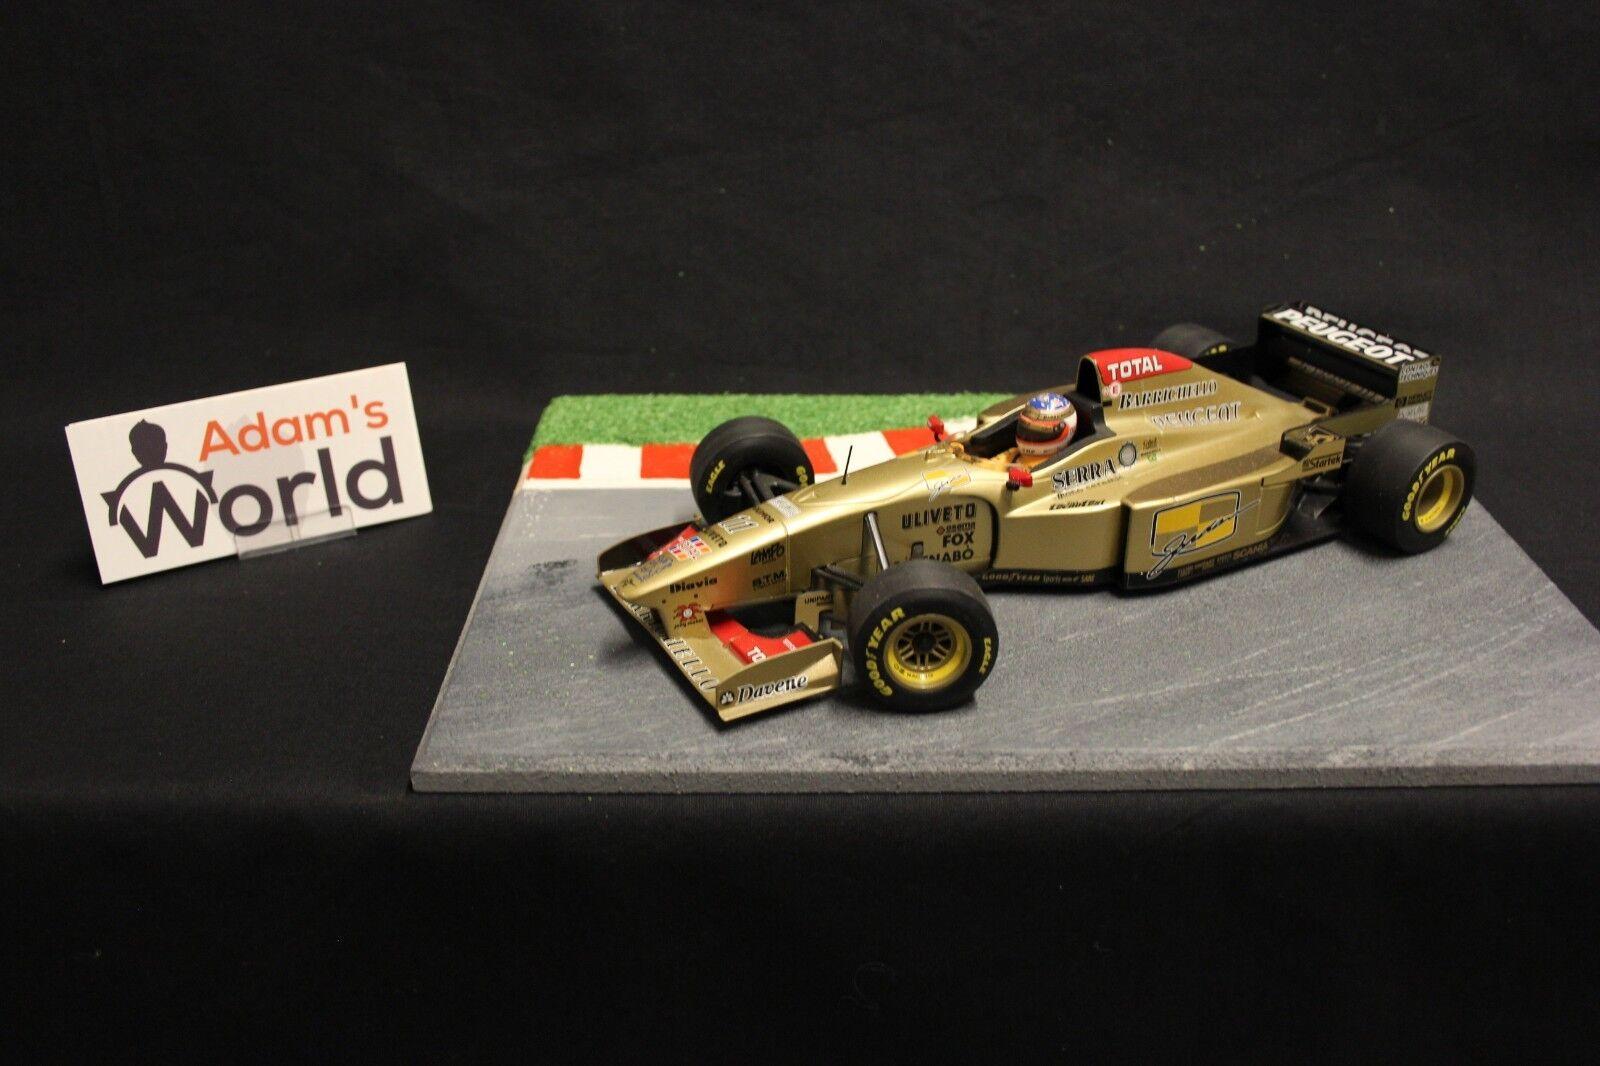 buscando agente de ventas Minichamps Jordan Peugeot 196 1996 1 18    11 Rubens Barrichello (BRA) (F1NB)  mejor calidad